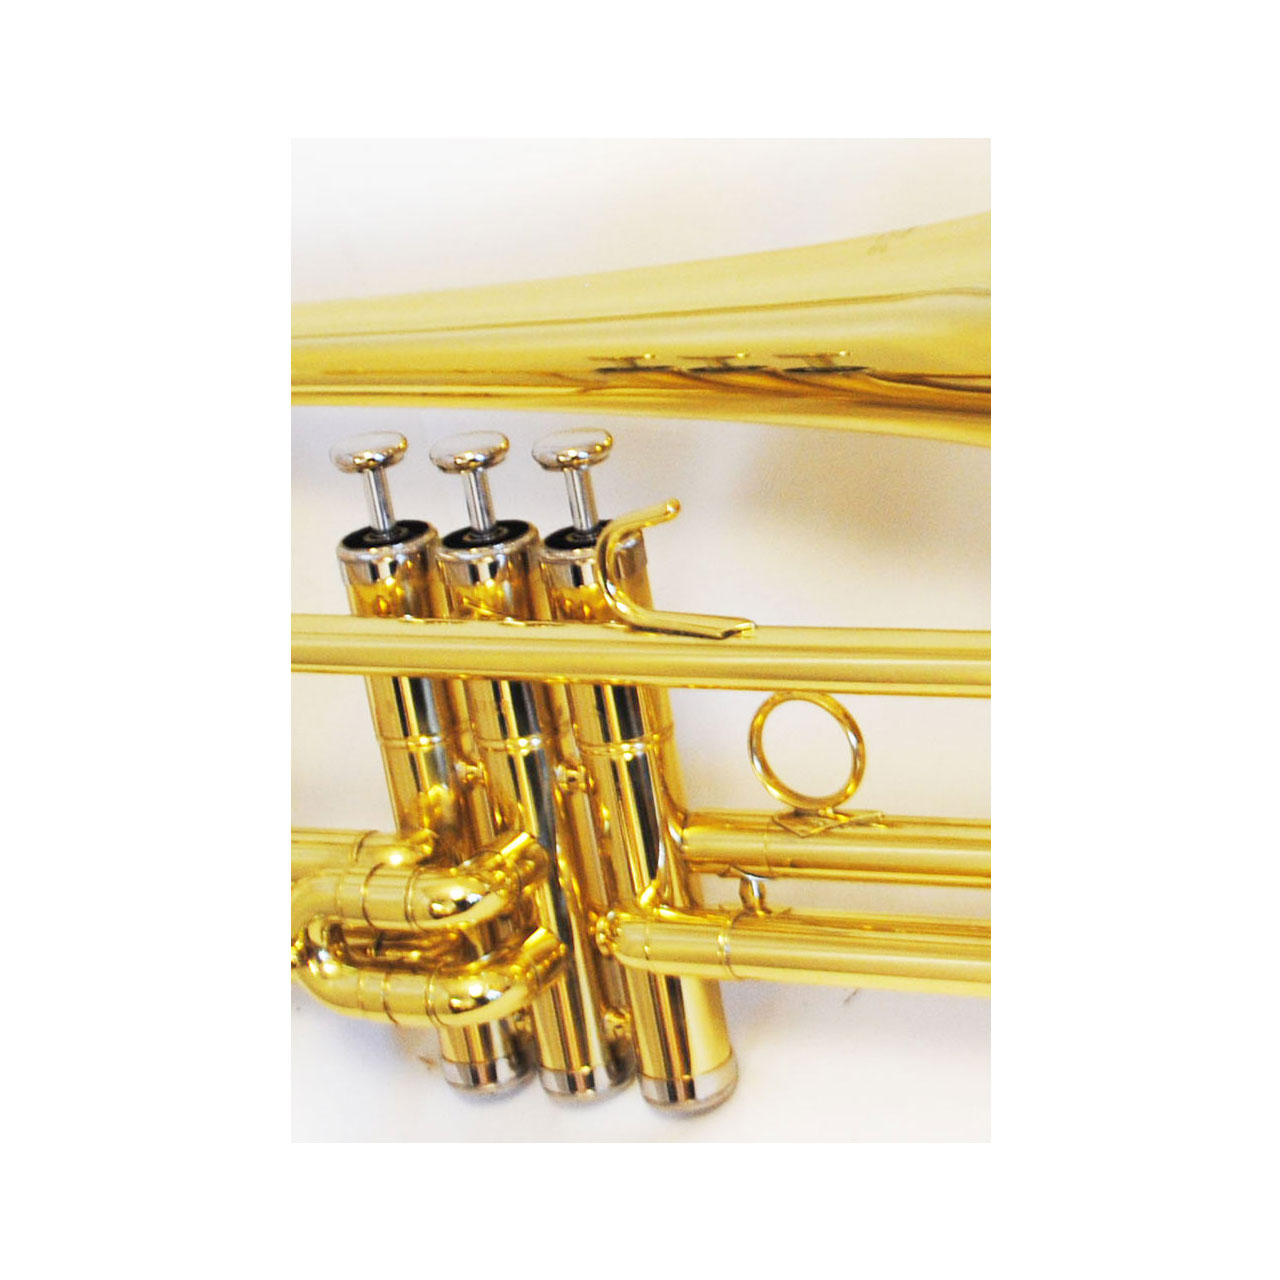 American Heritage Piston Valve F Trombone